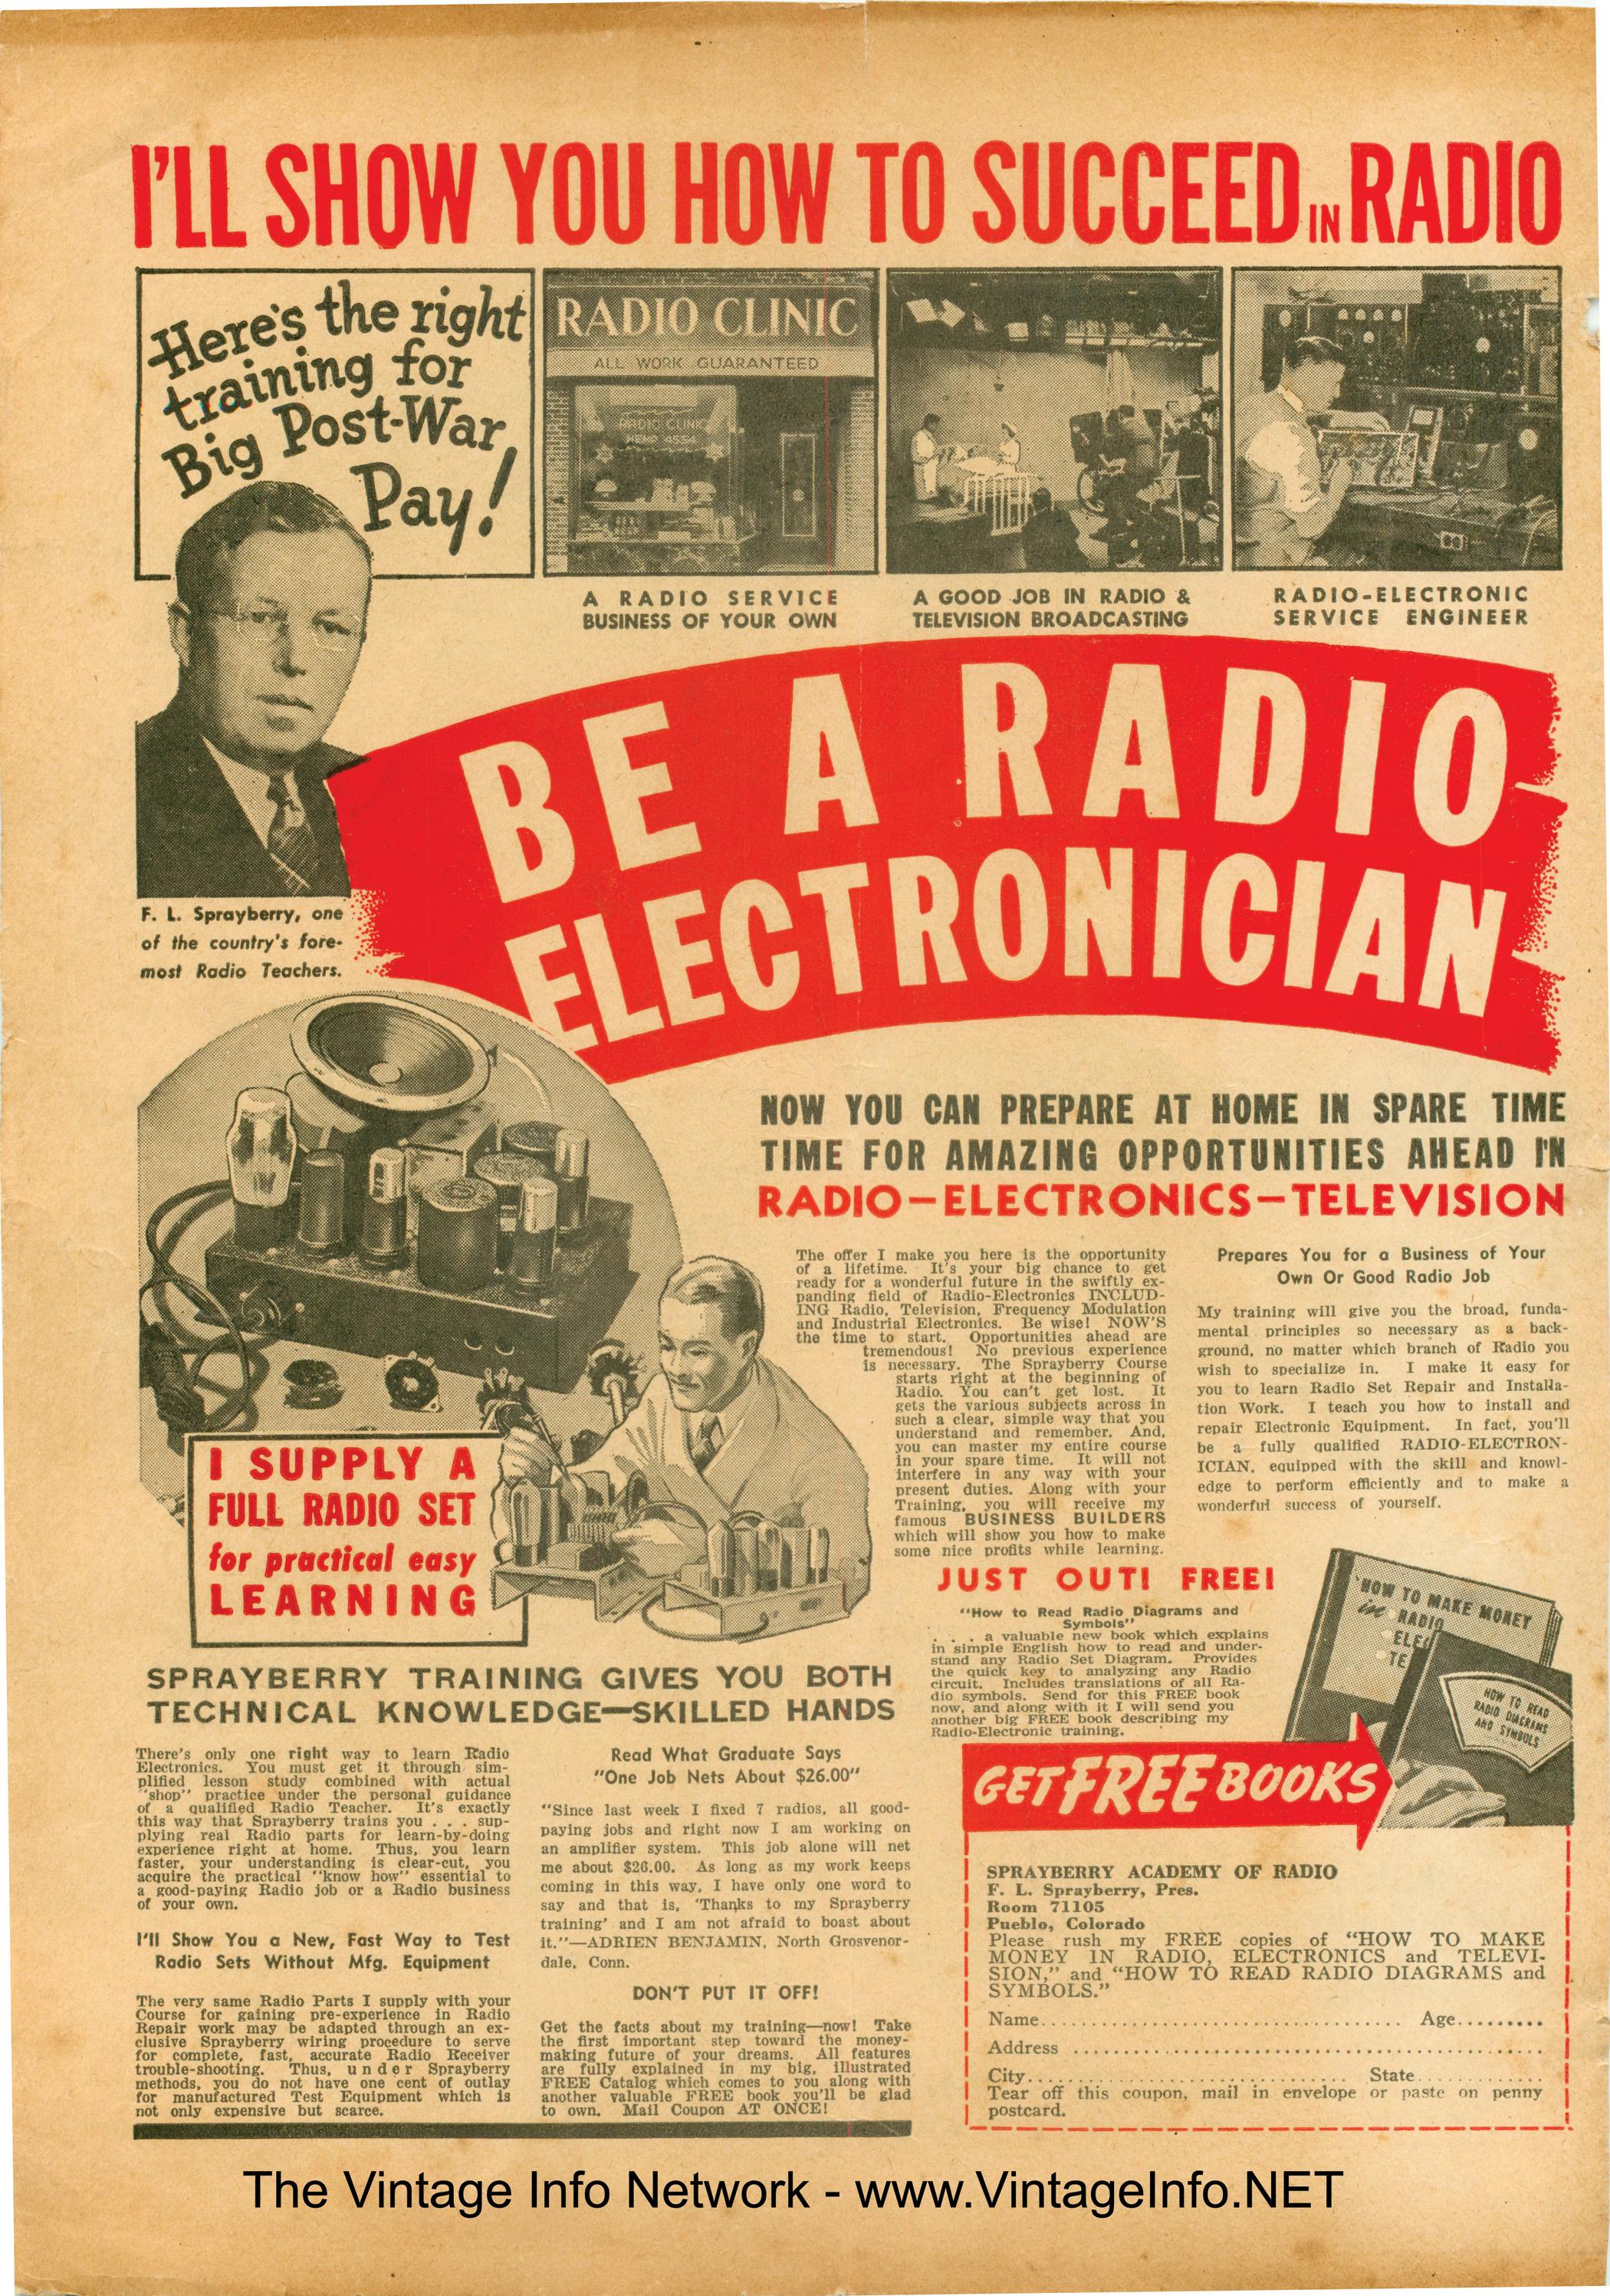 radio_electronician_ad1